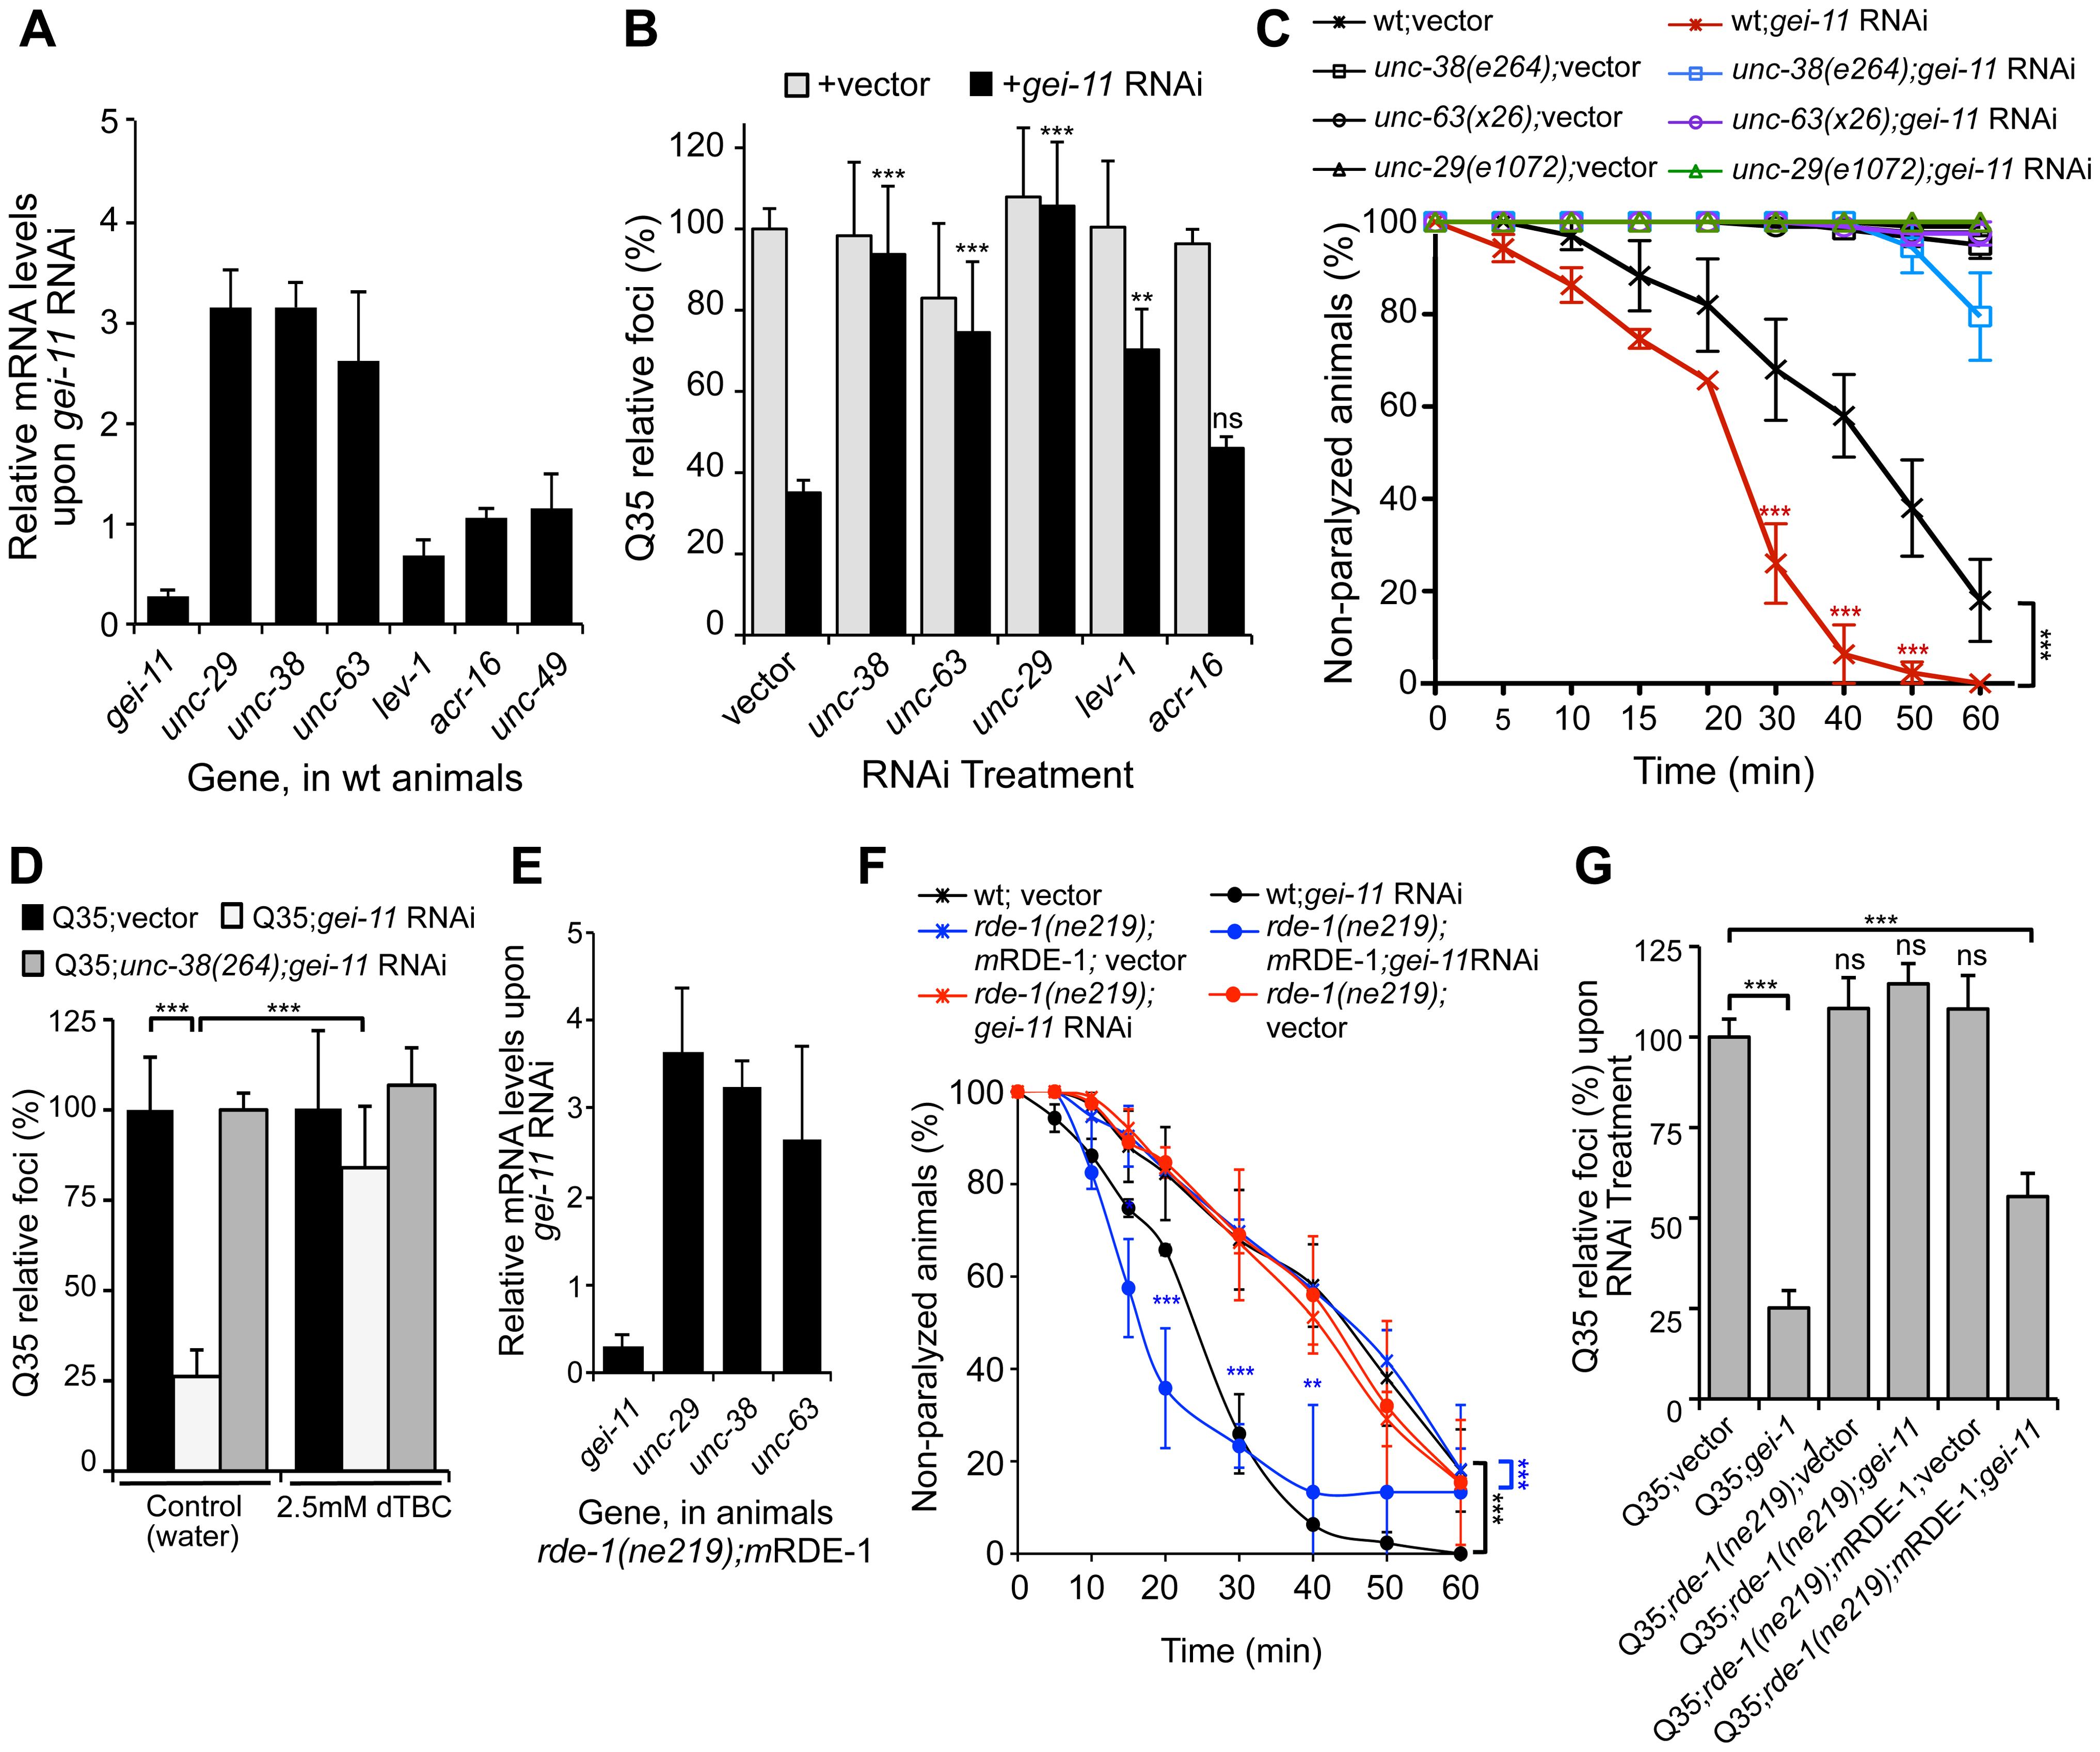 <i>gei-11</i> knockdown effect through regulation of cholinergic receptors at the NMJ.